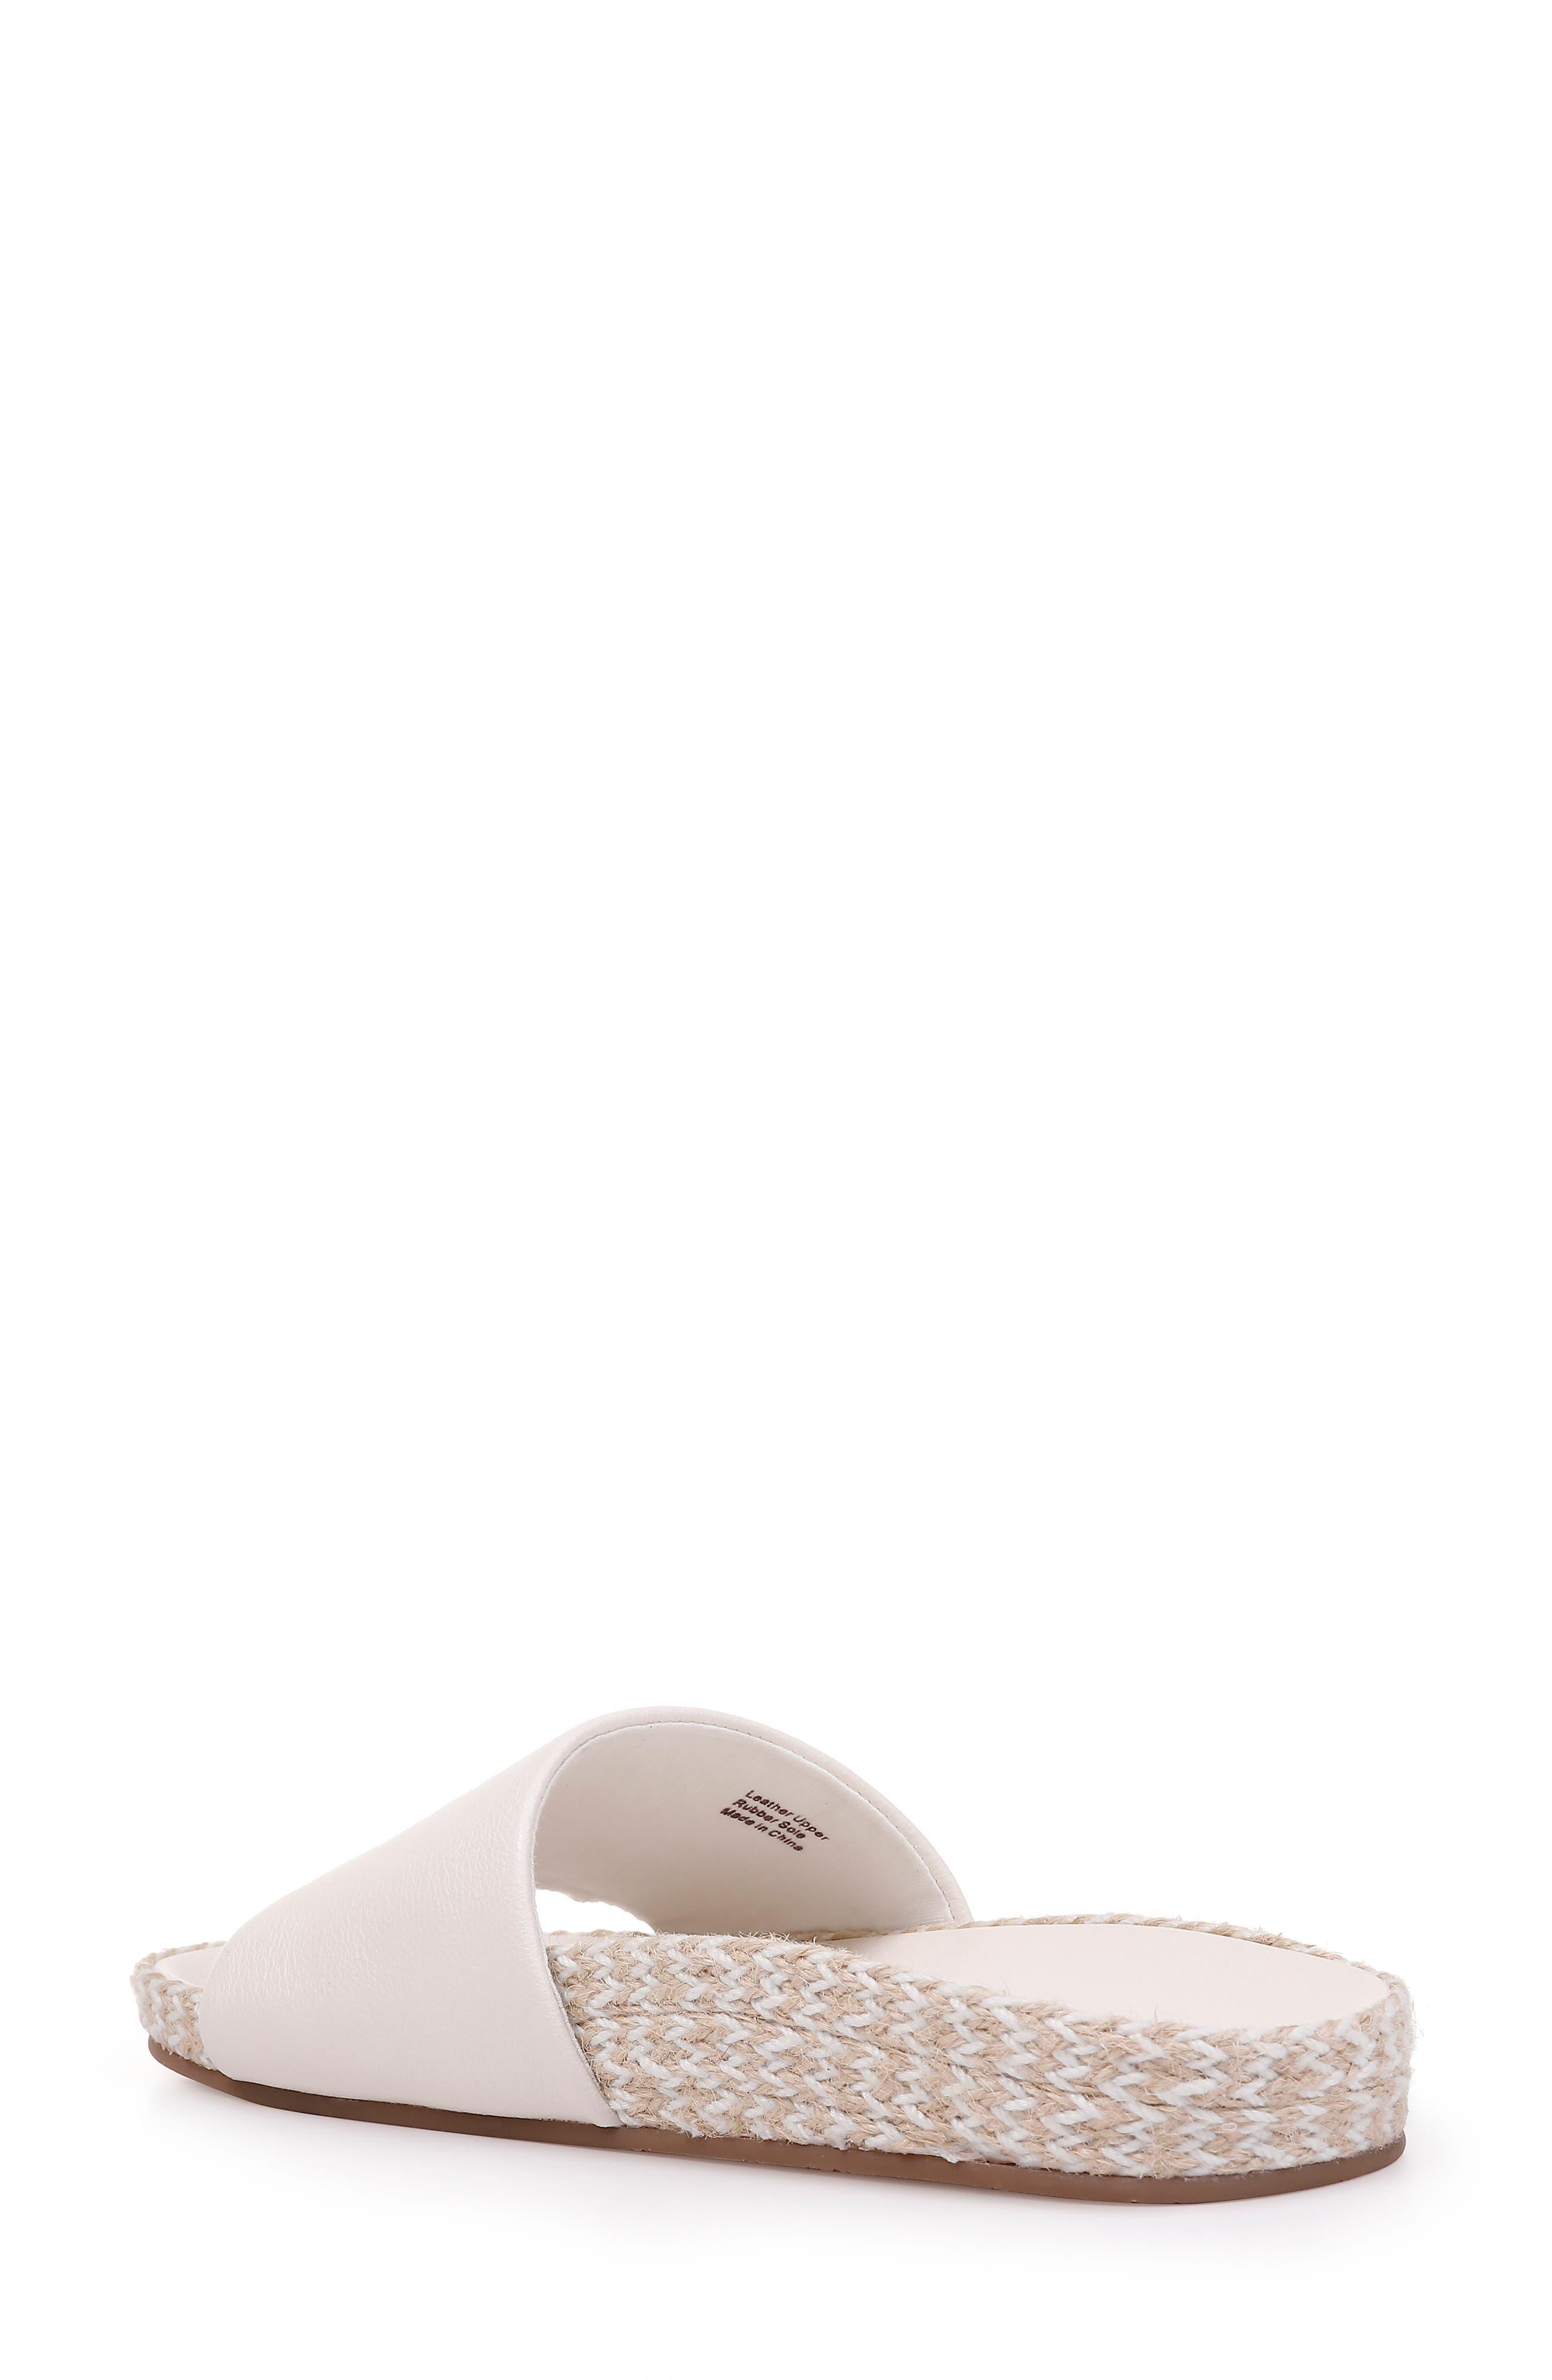 Sandford Espadrille Slide Sandal,                             Alternate thumbnail 2, color,                             OFF WHITE LEATHER